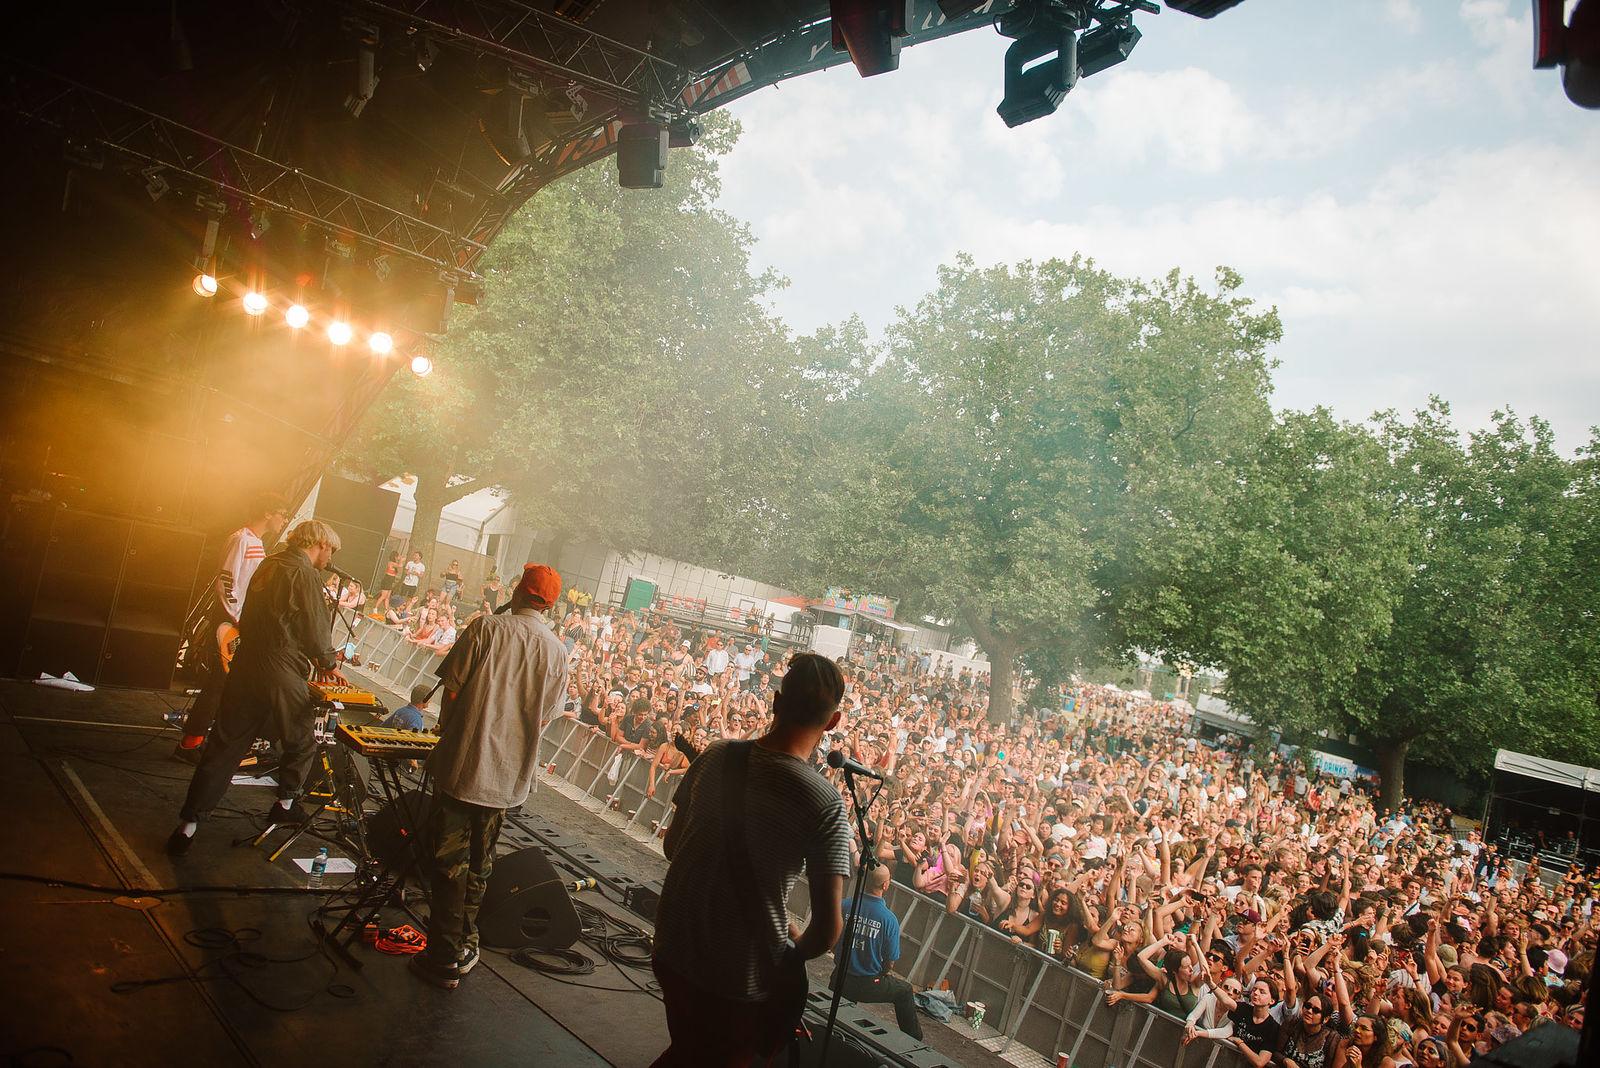 Finsbury Park 2018